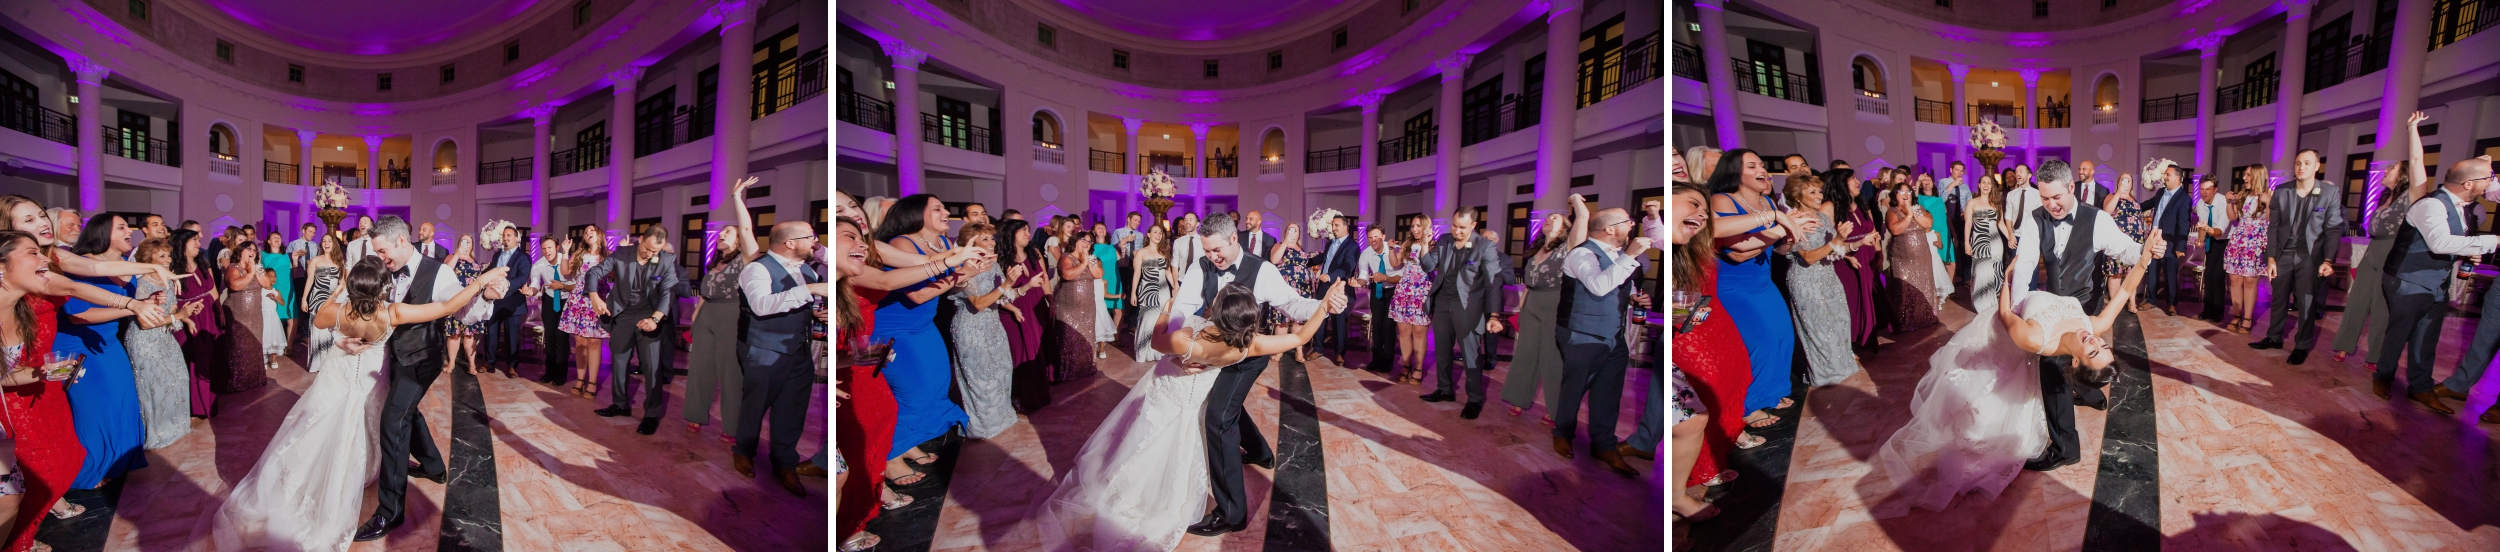 Wedding Hotel Colonnade Coral Gables - Santy Martinez 36.jpg